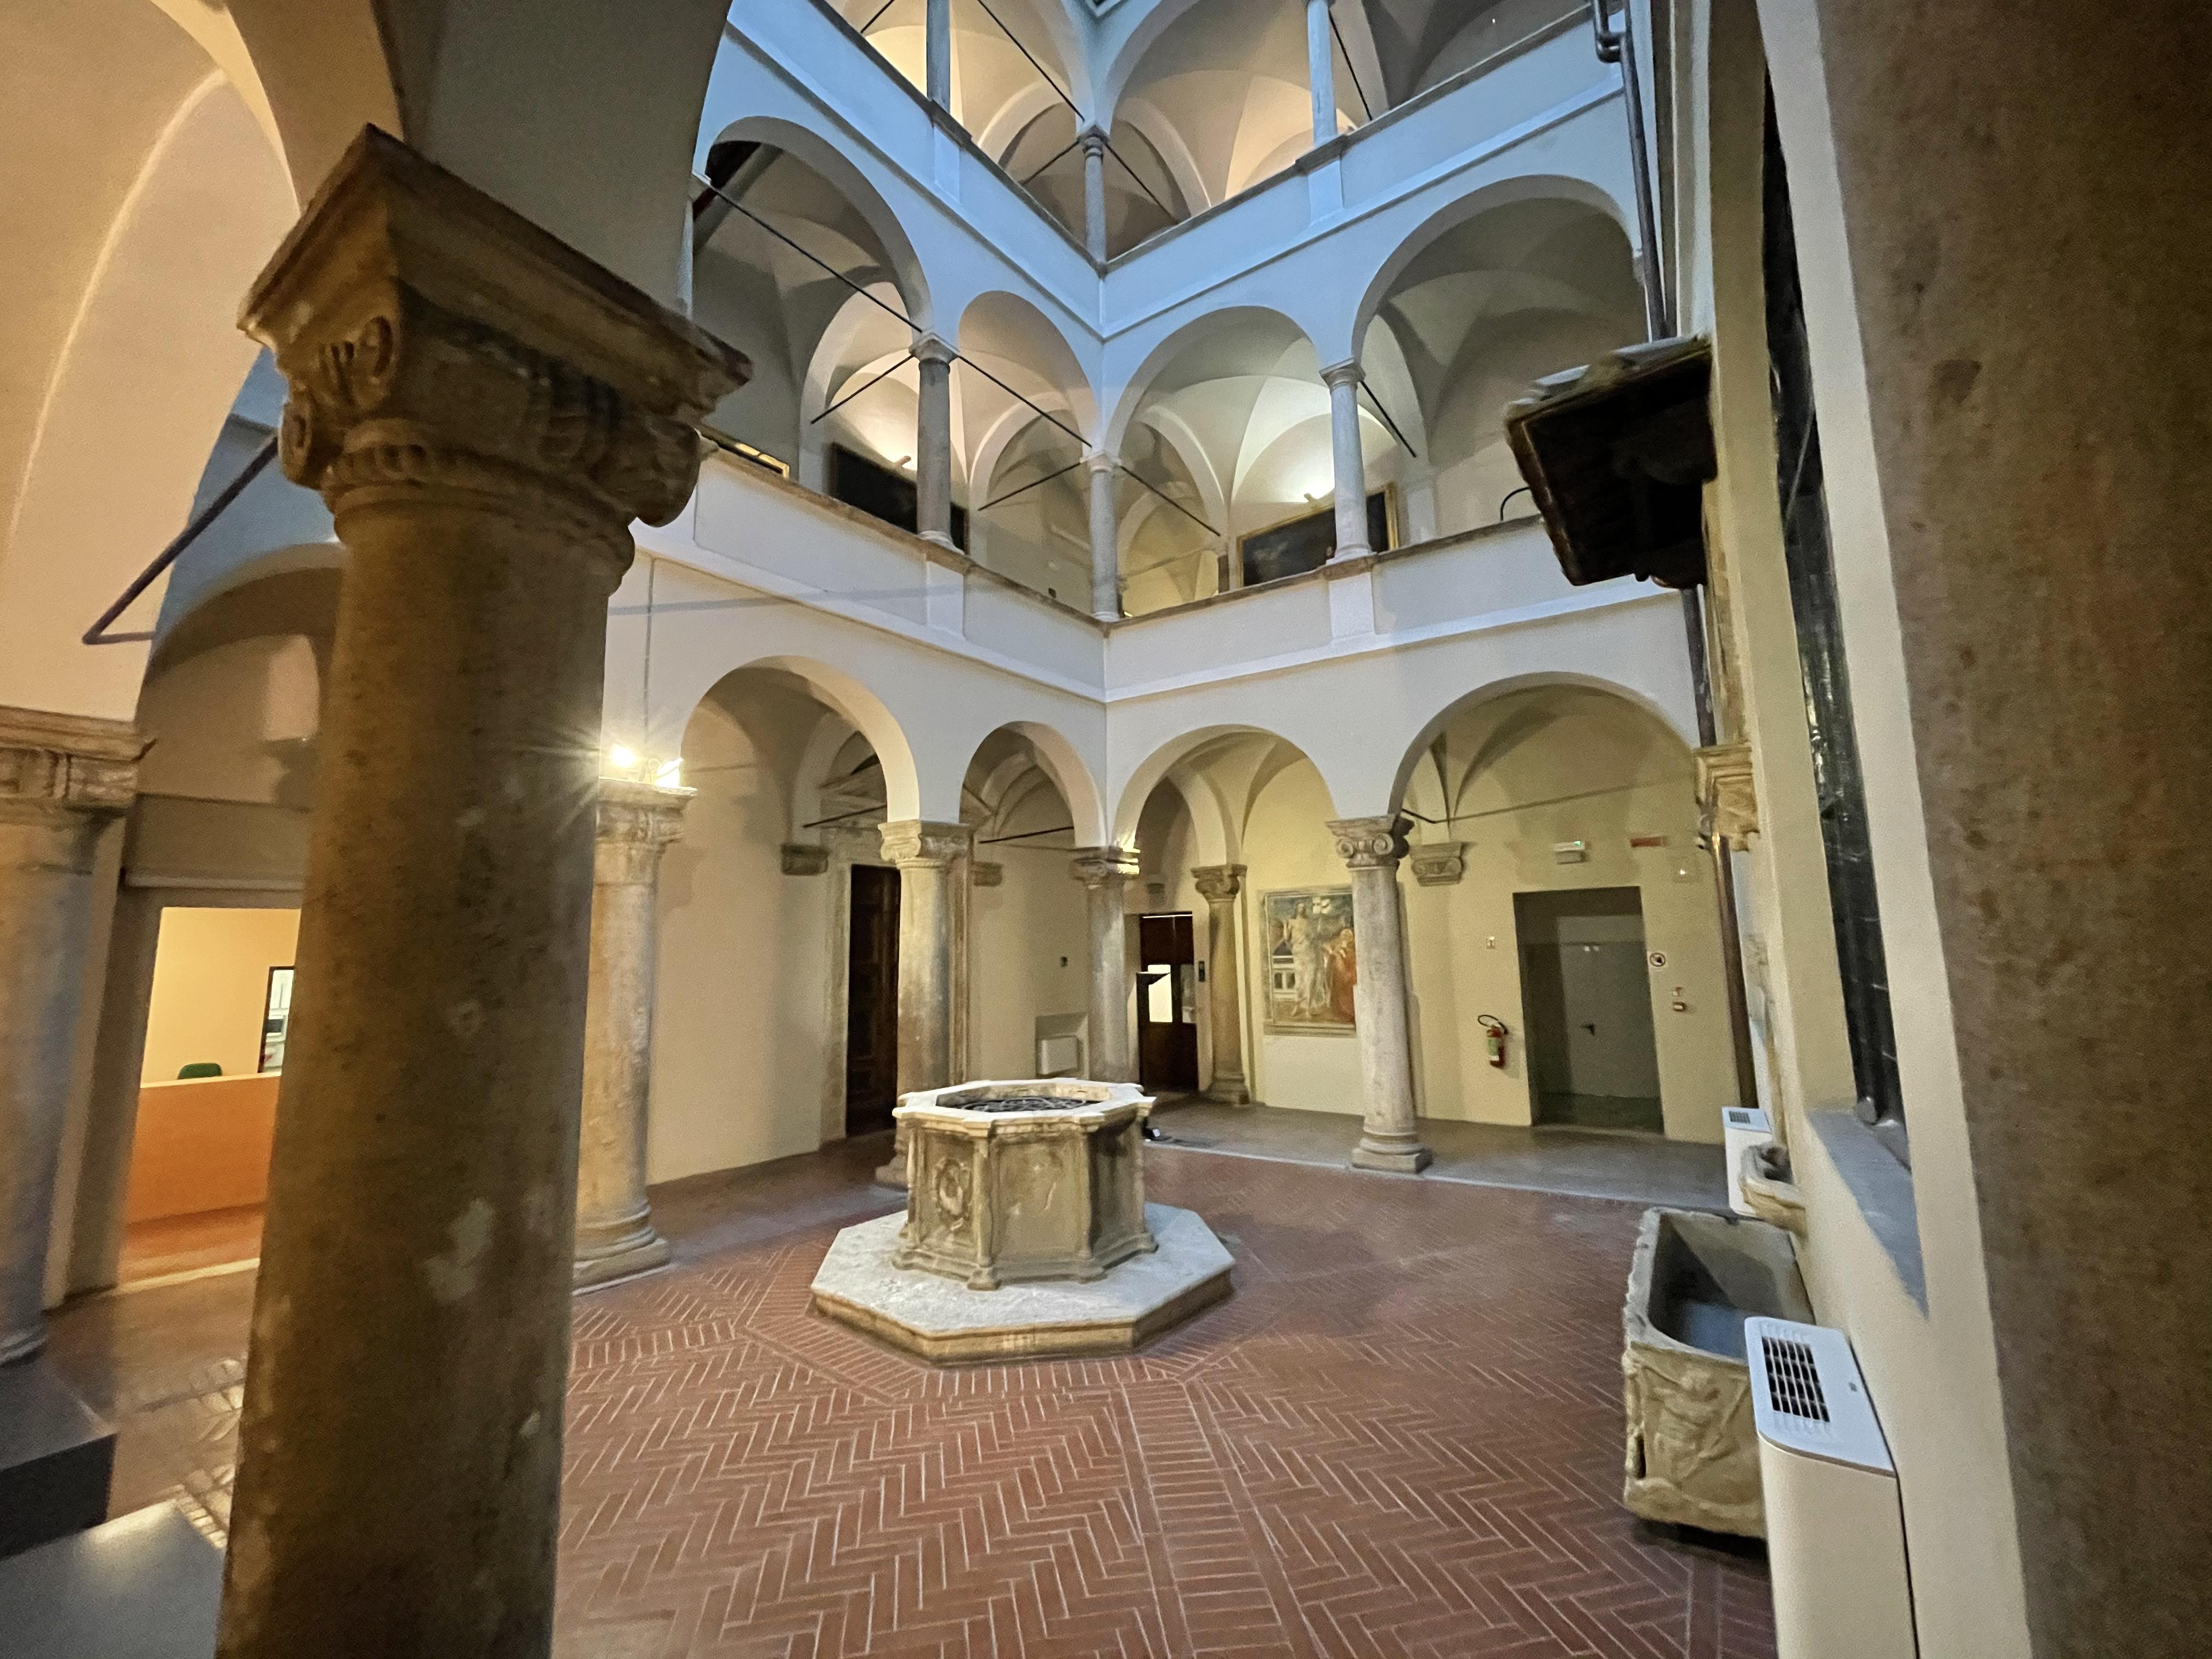 https://pinacotecanazionale.siena.it/wp-content/uploads/chiostro.jpeg